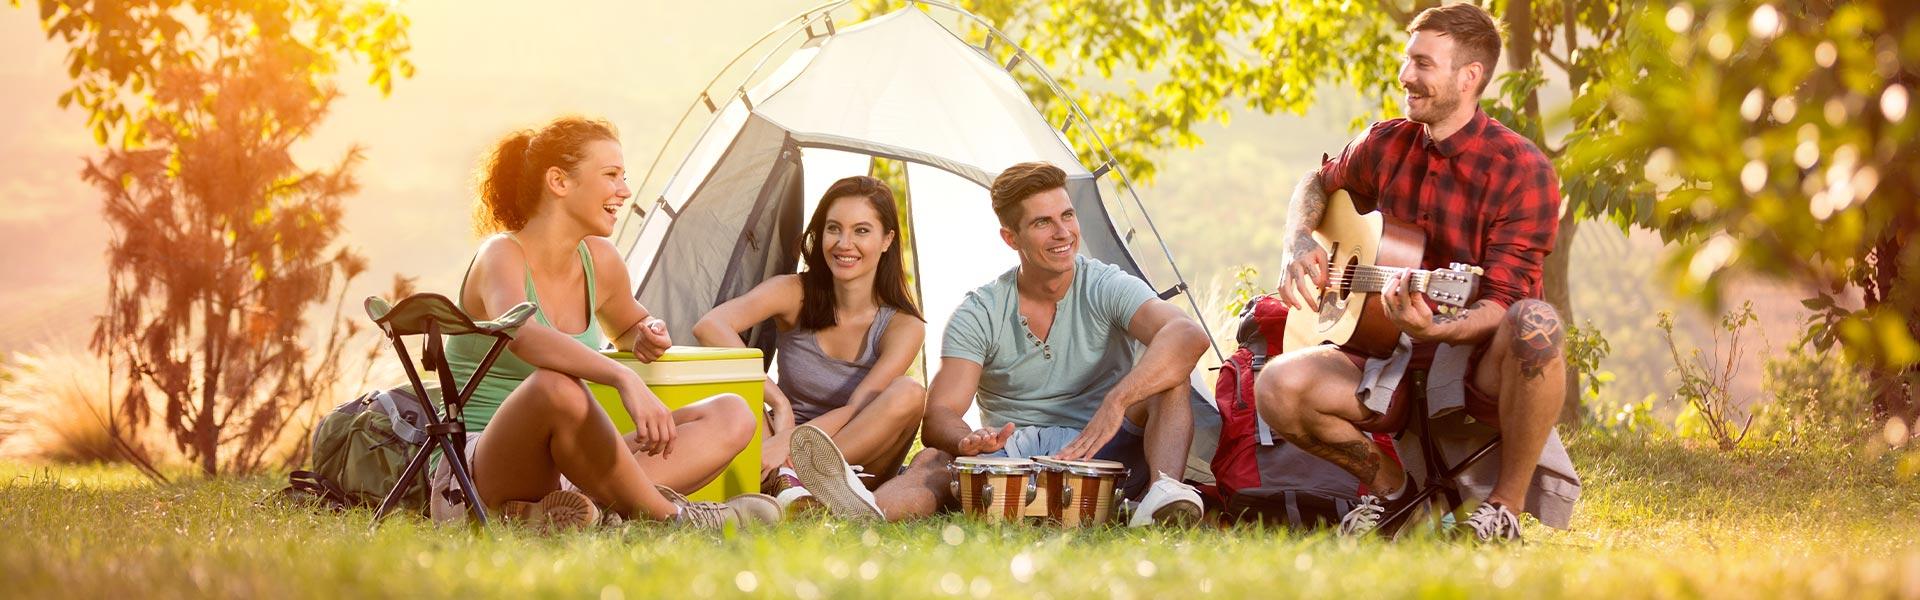 Camping Le Petit Bois - Camors - Morbihan destiné Camping Golf Du Morbihan Avec Piscine